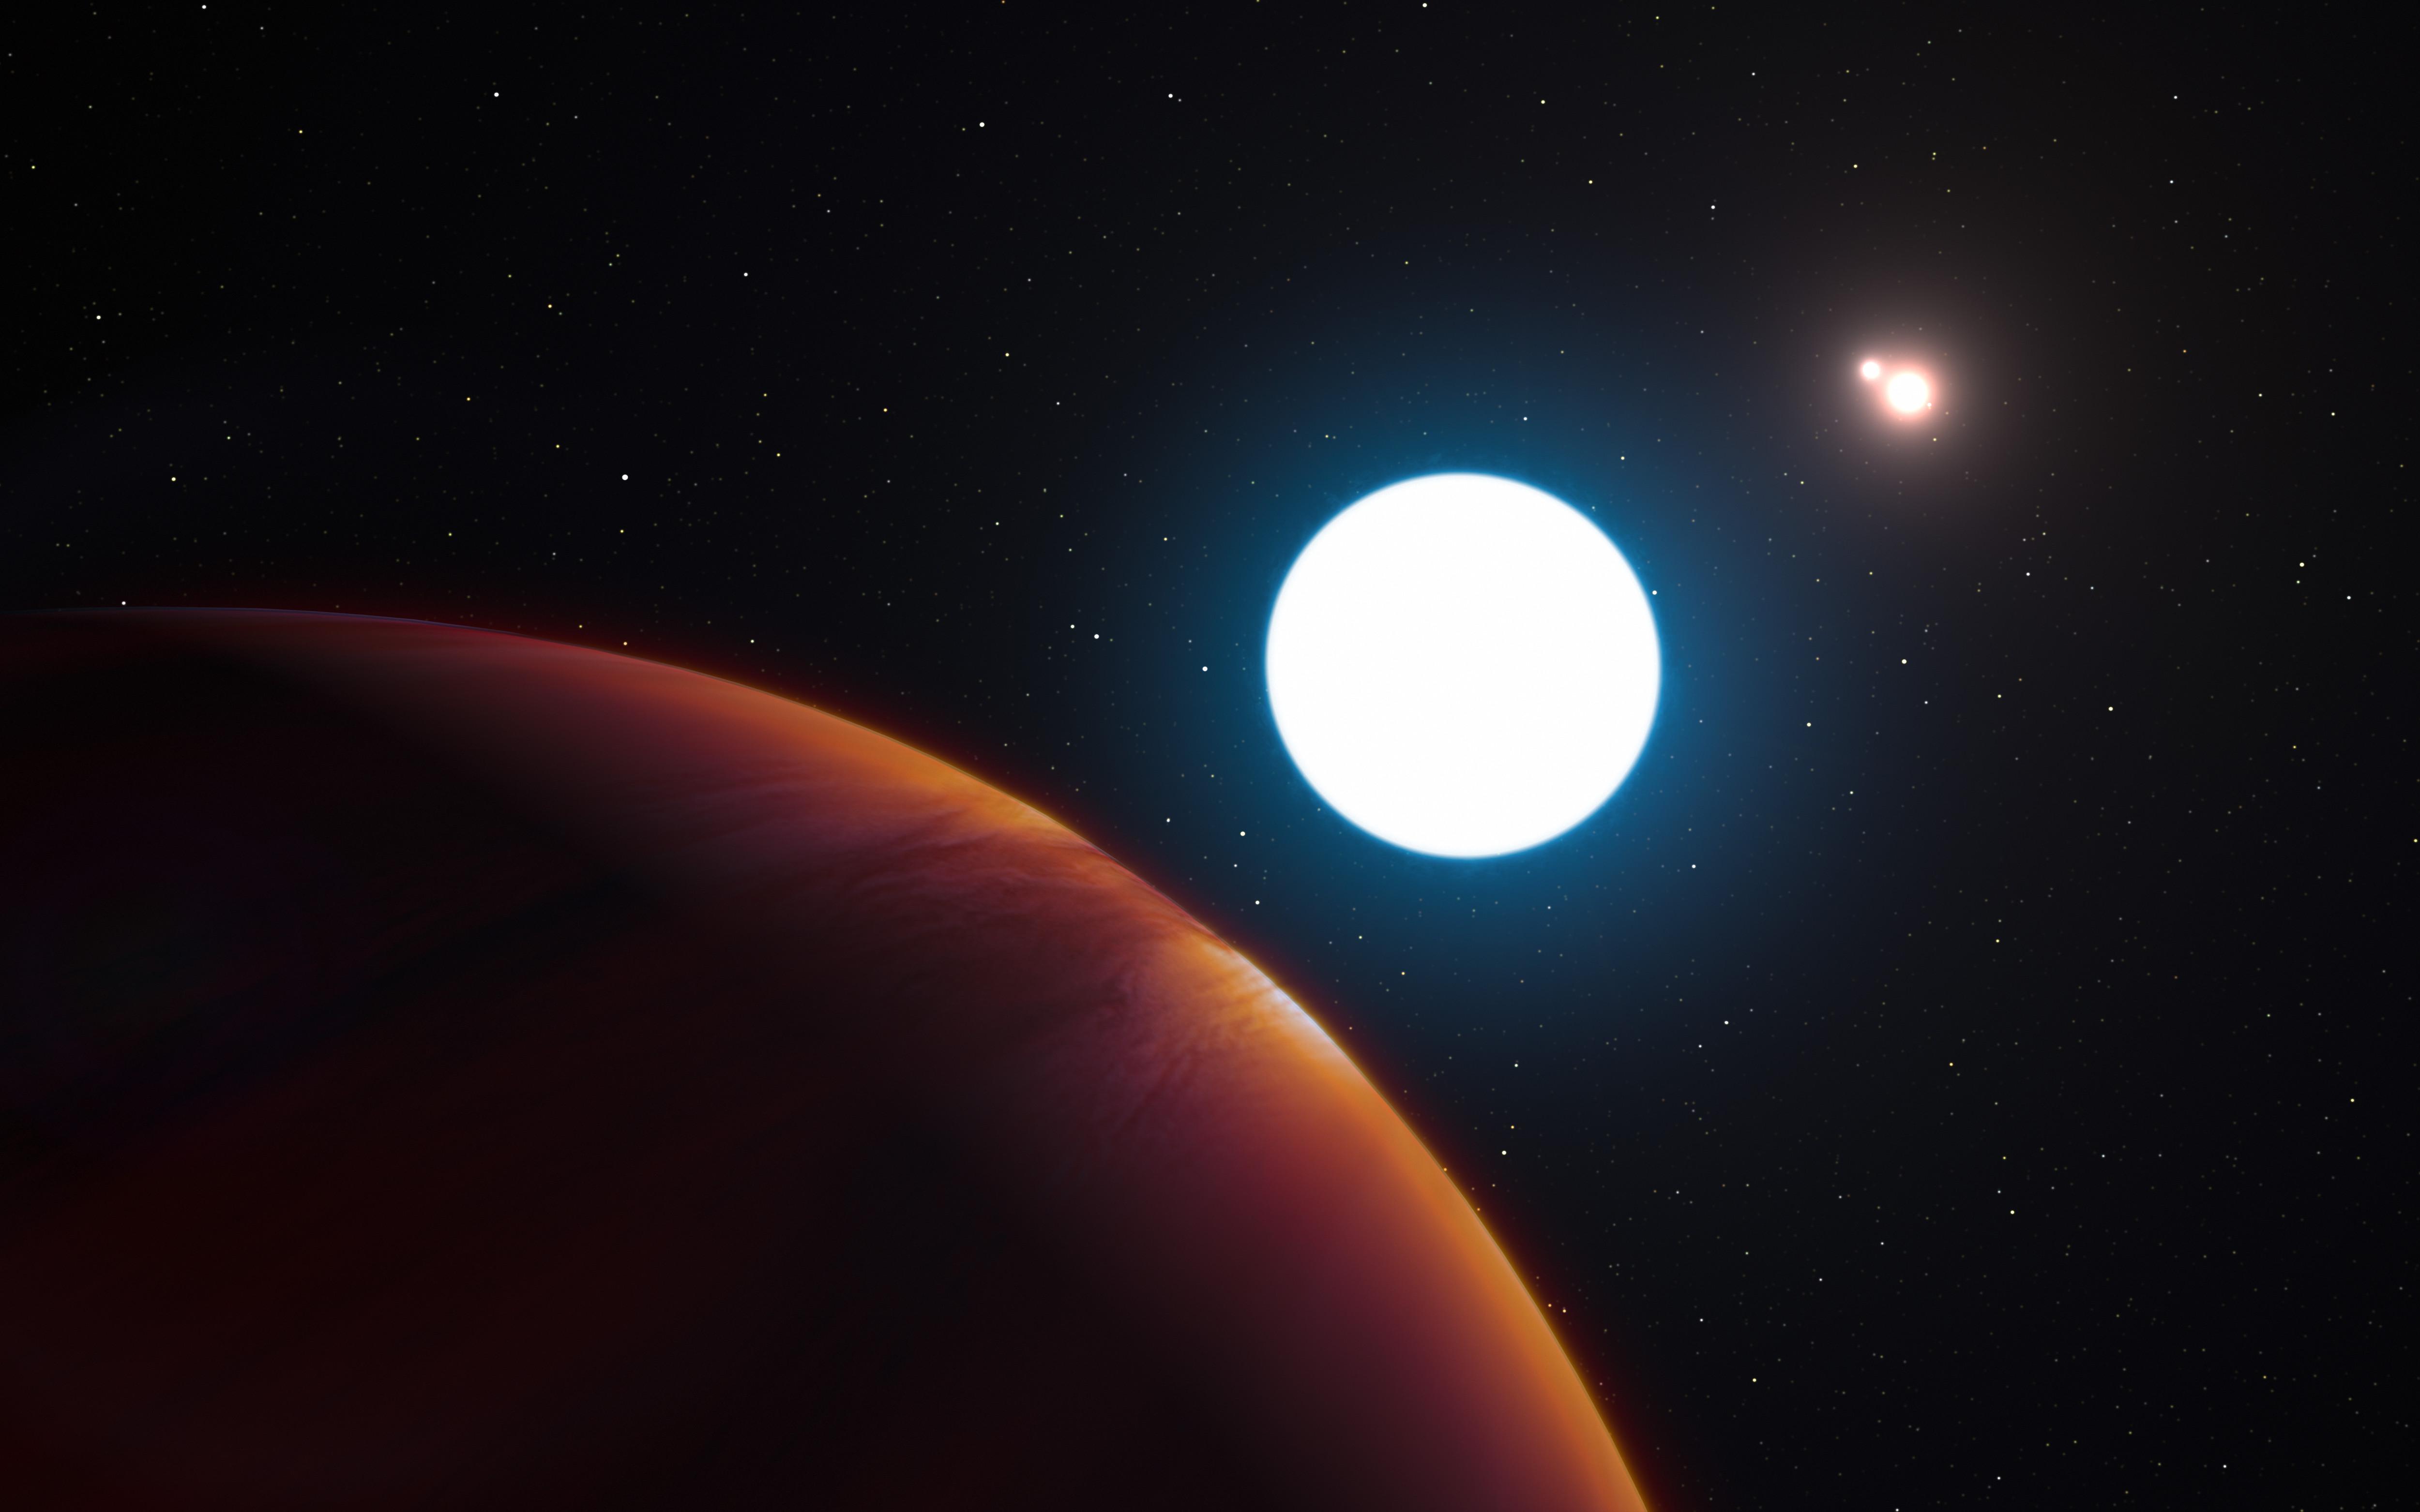 new planet, HD 131399Ab